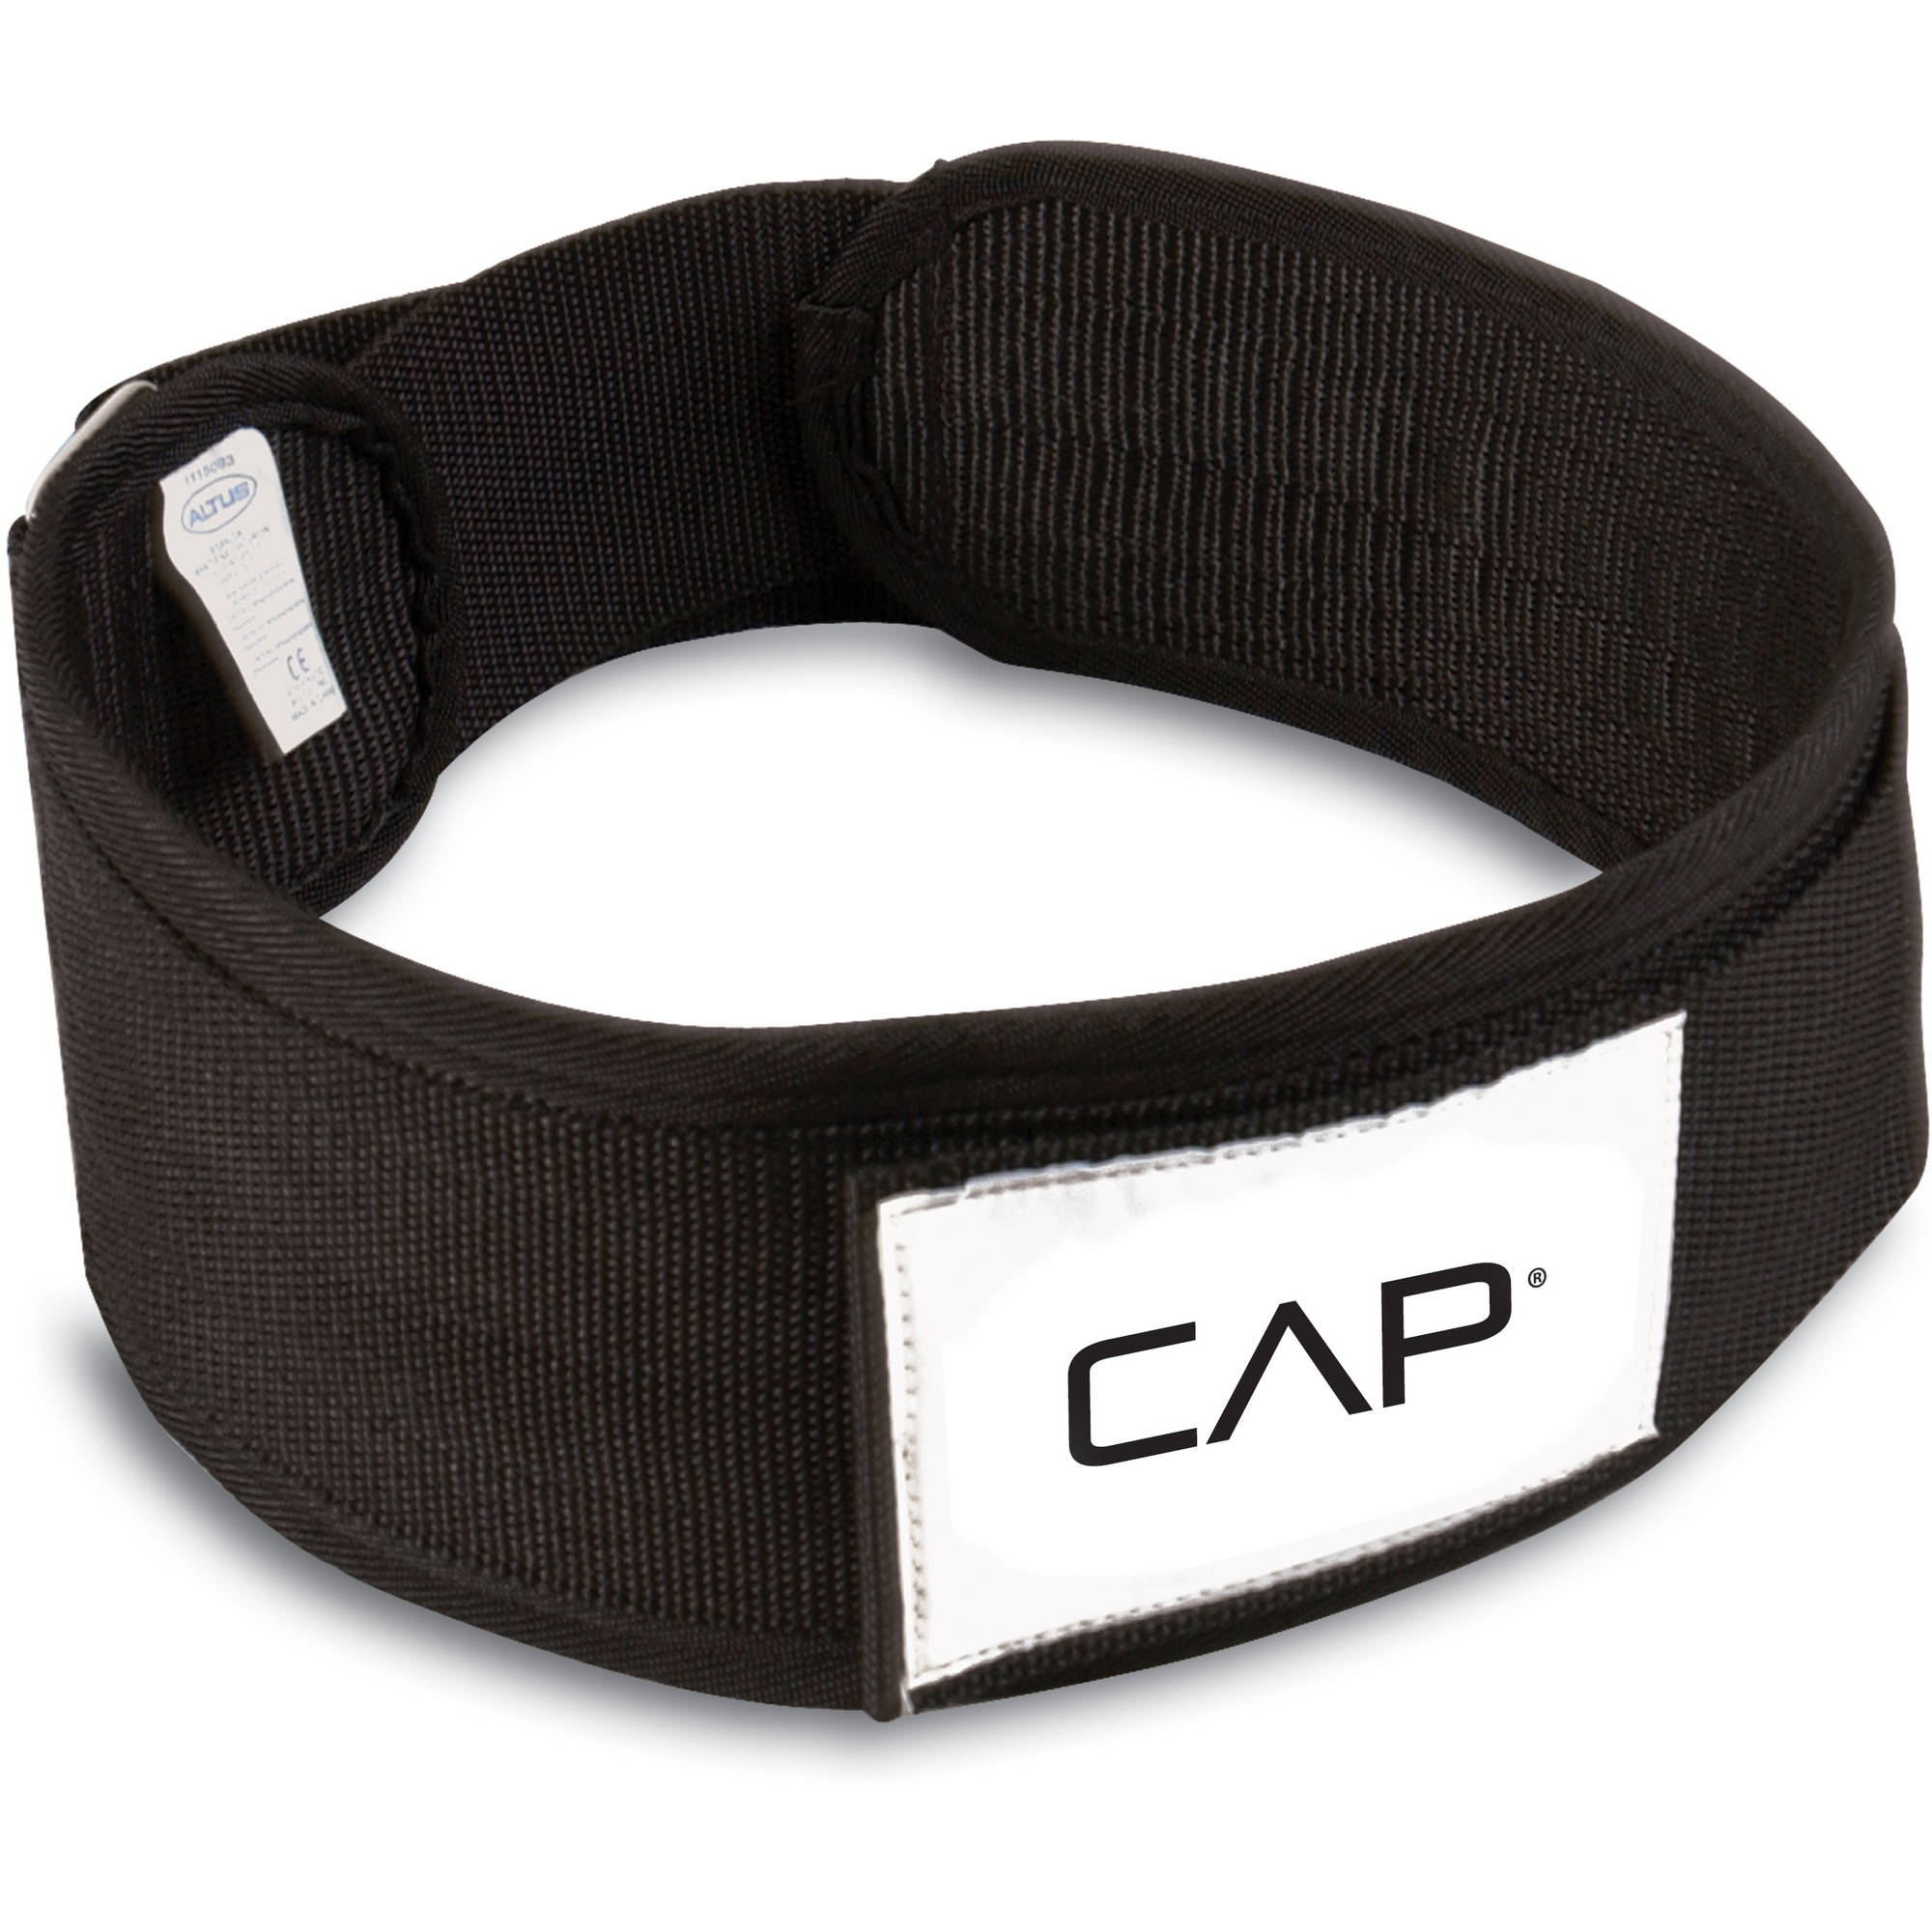 CAP Weightlifting Belt